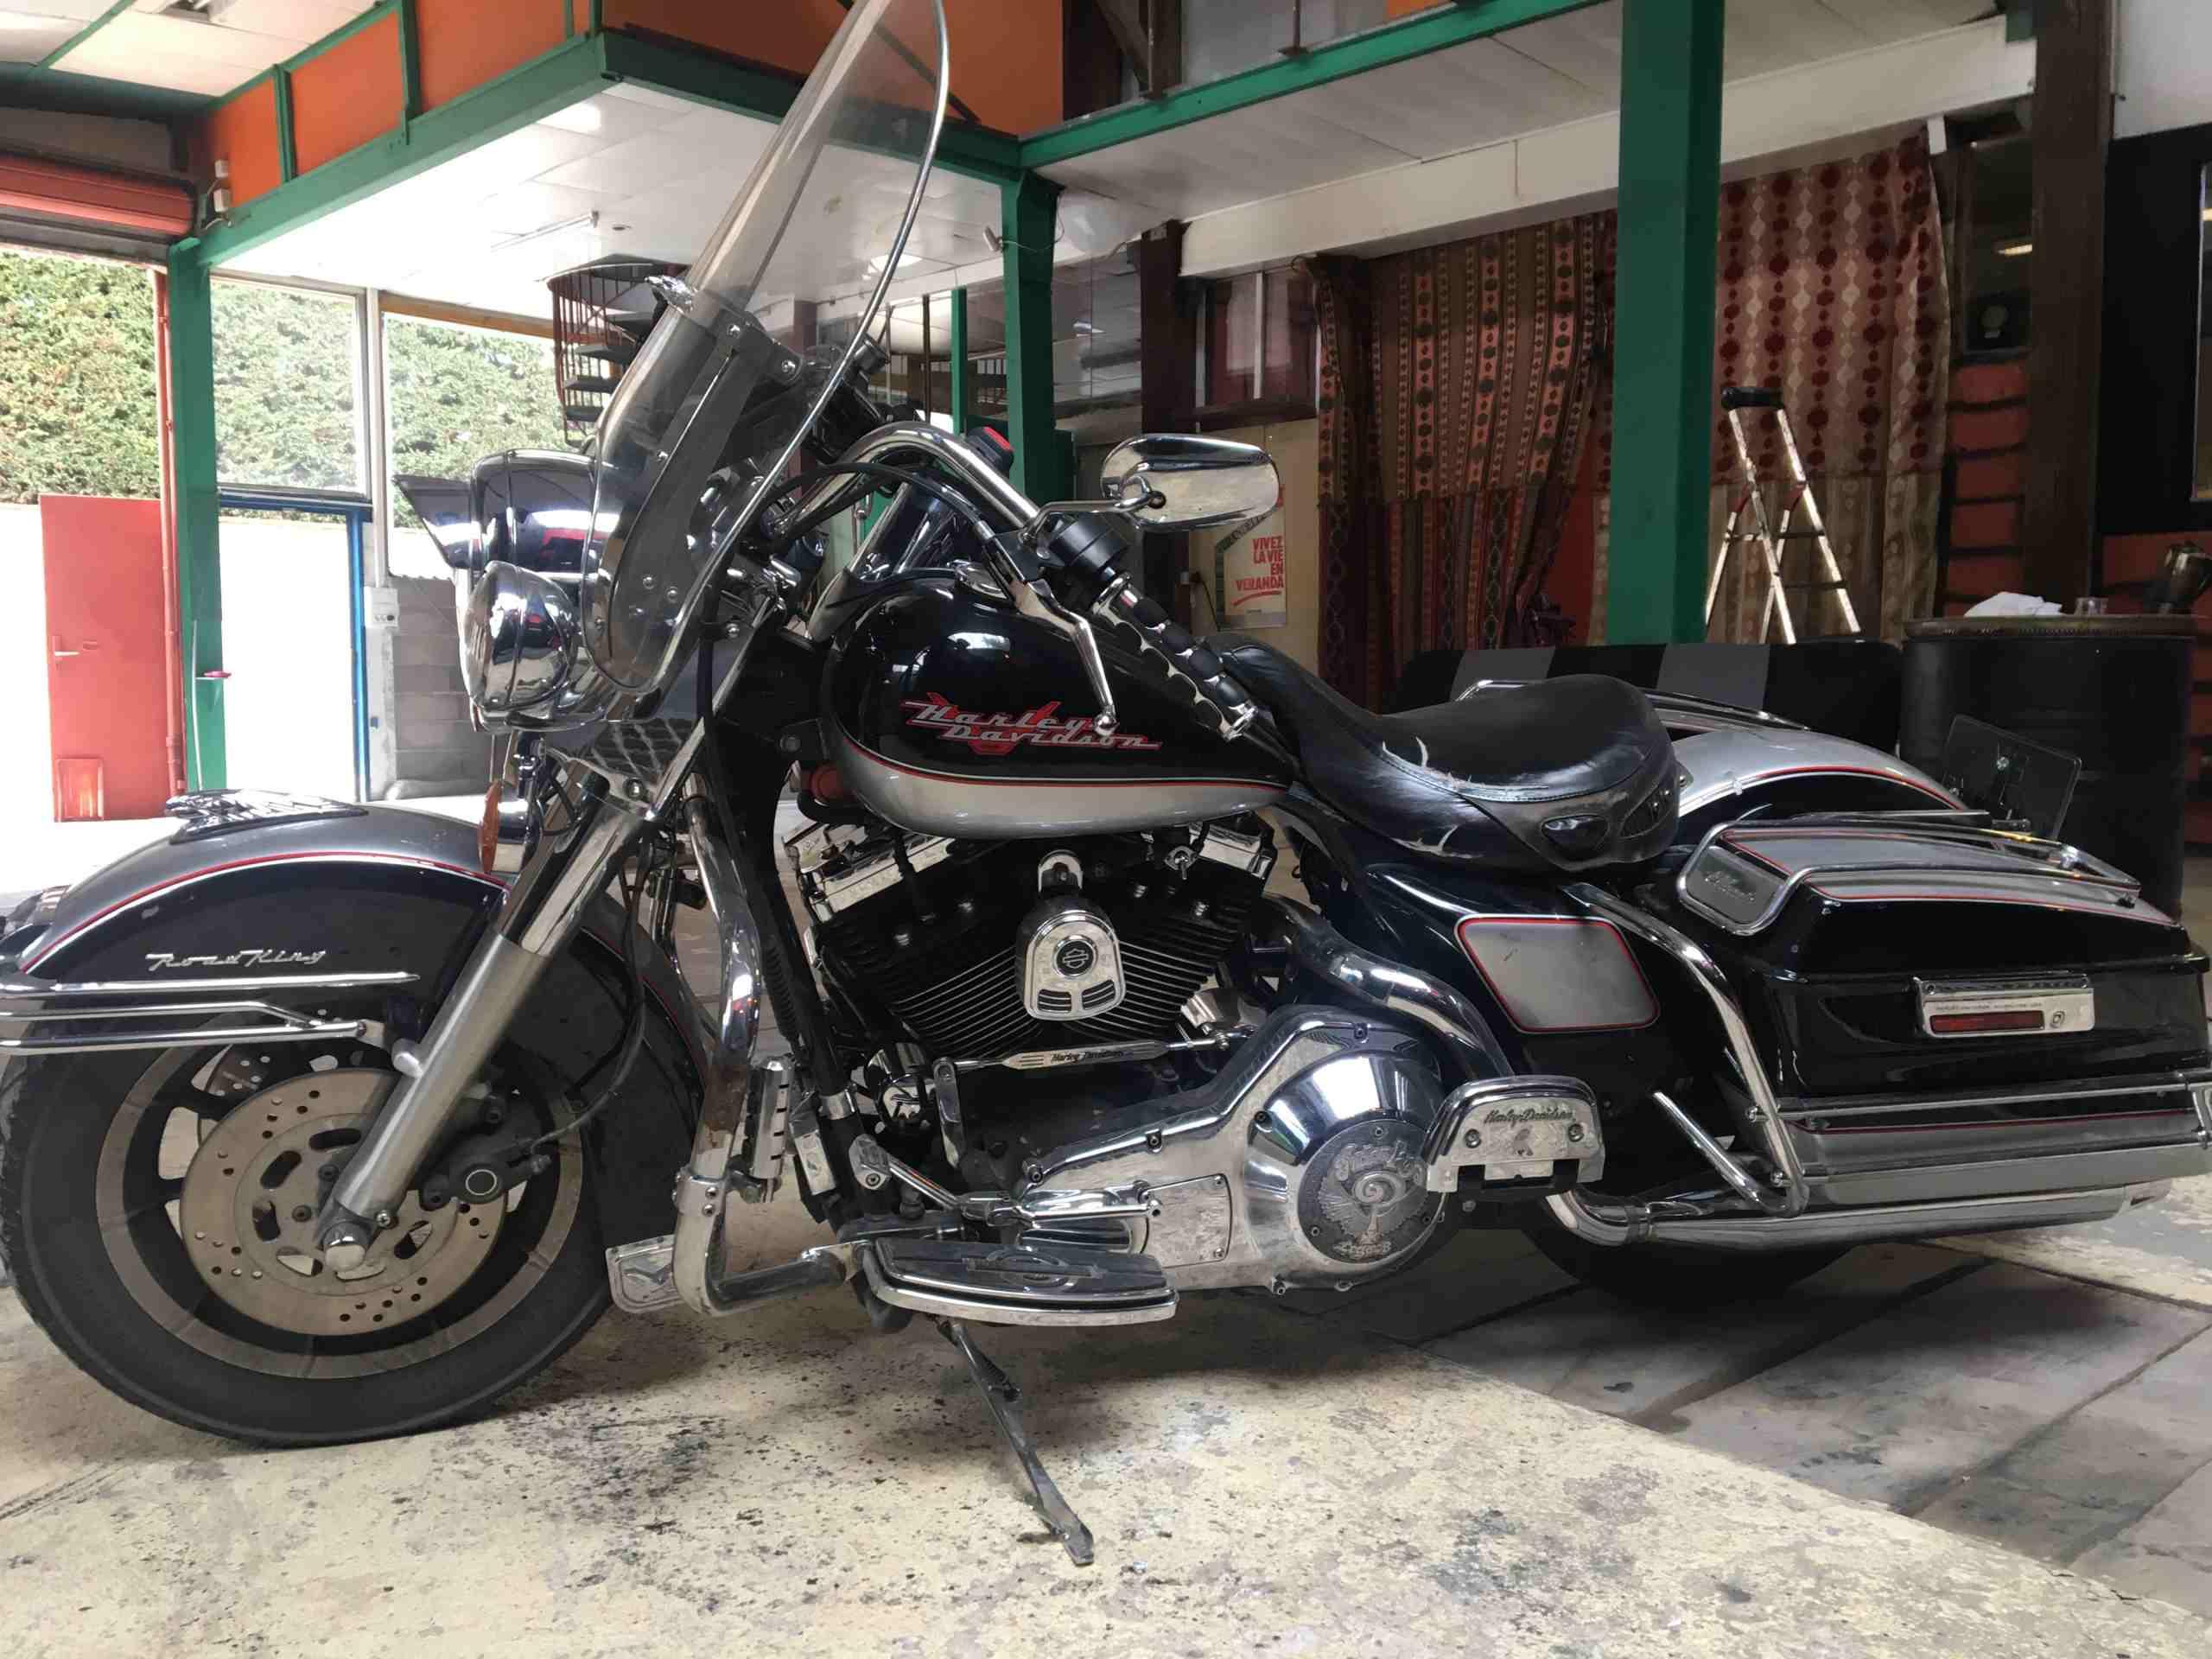 Harley Davidson Electra Glide Road King 1340cc carbu